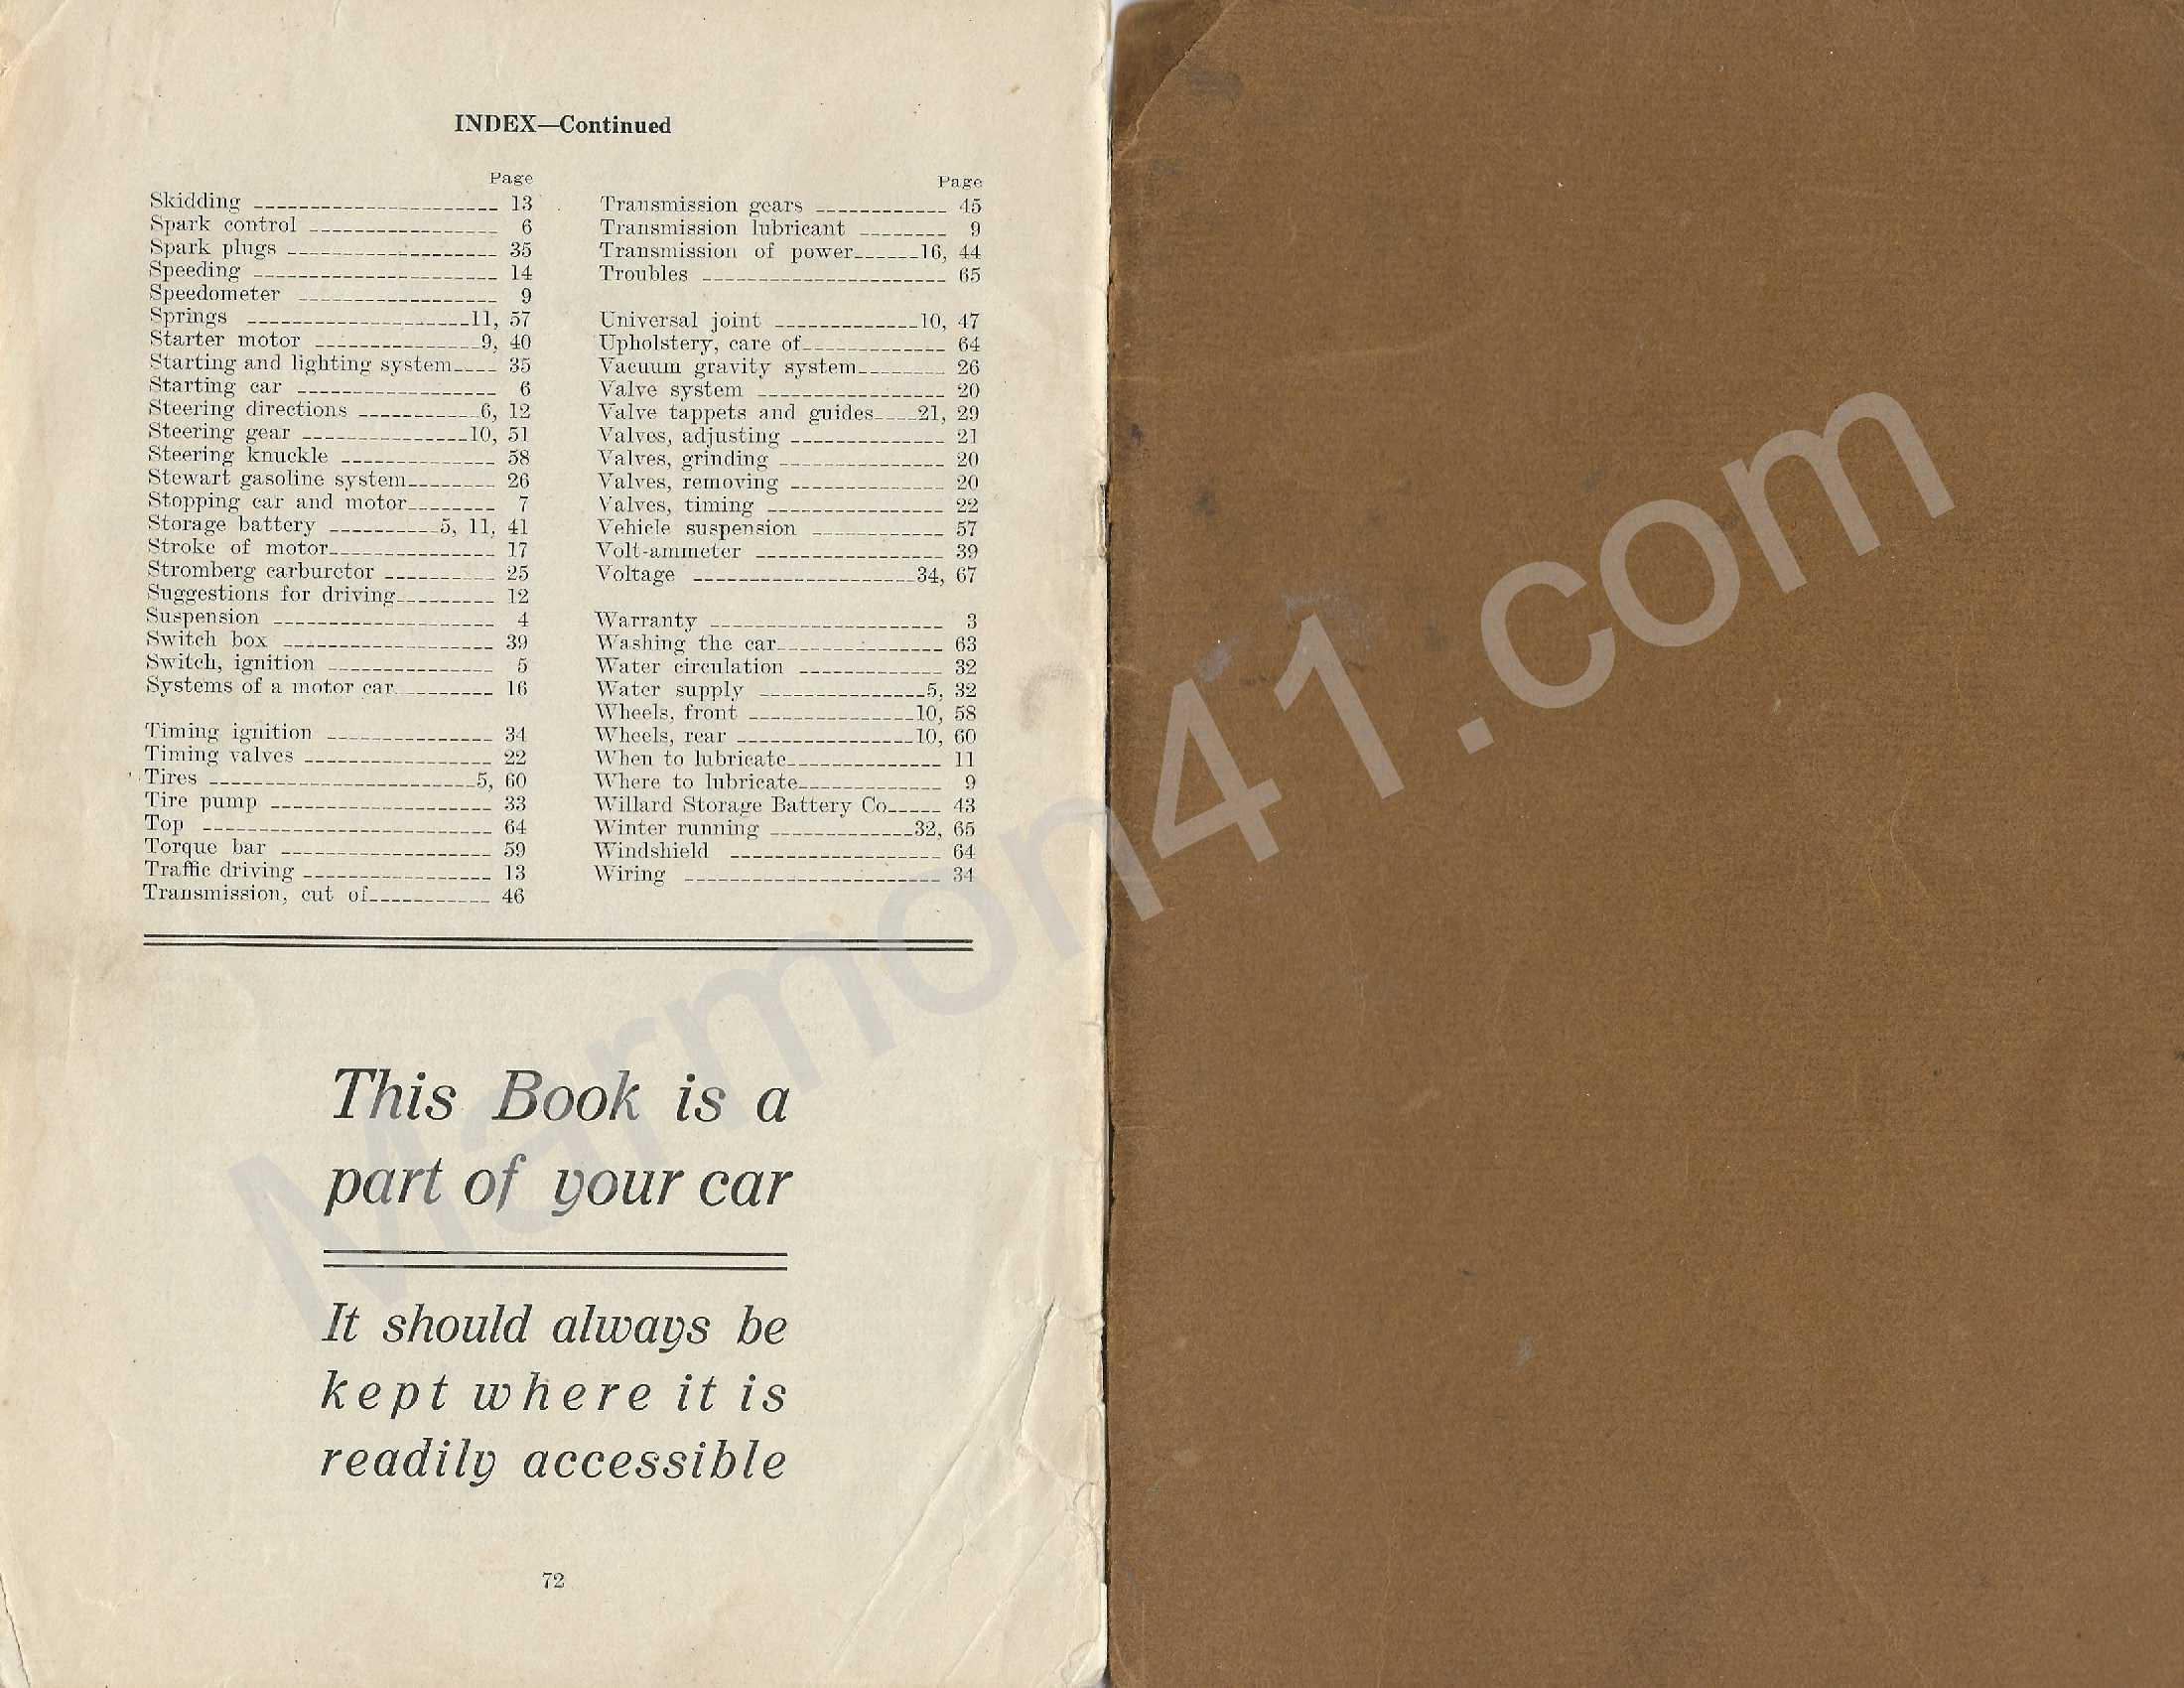 1915-07-01_Marmon41_Info_Book_1534-B_38